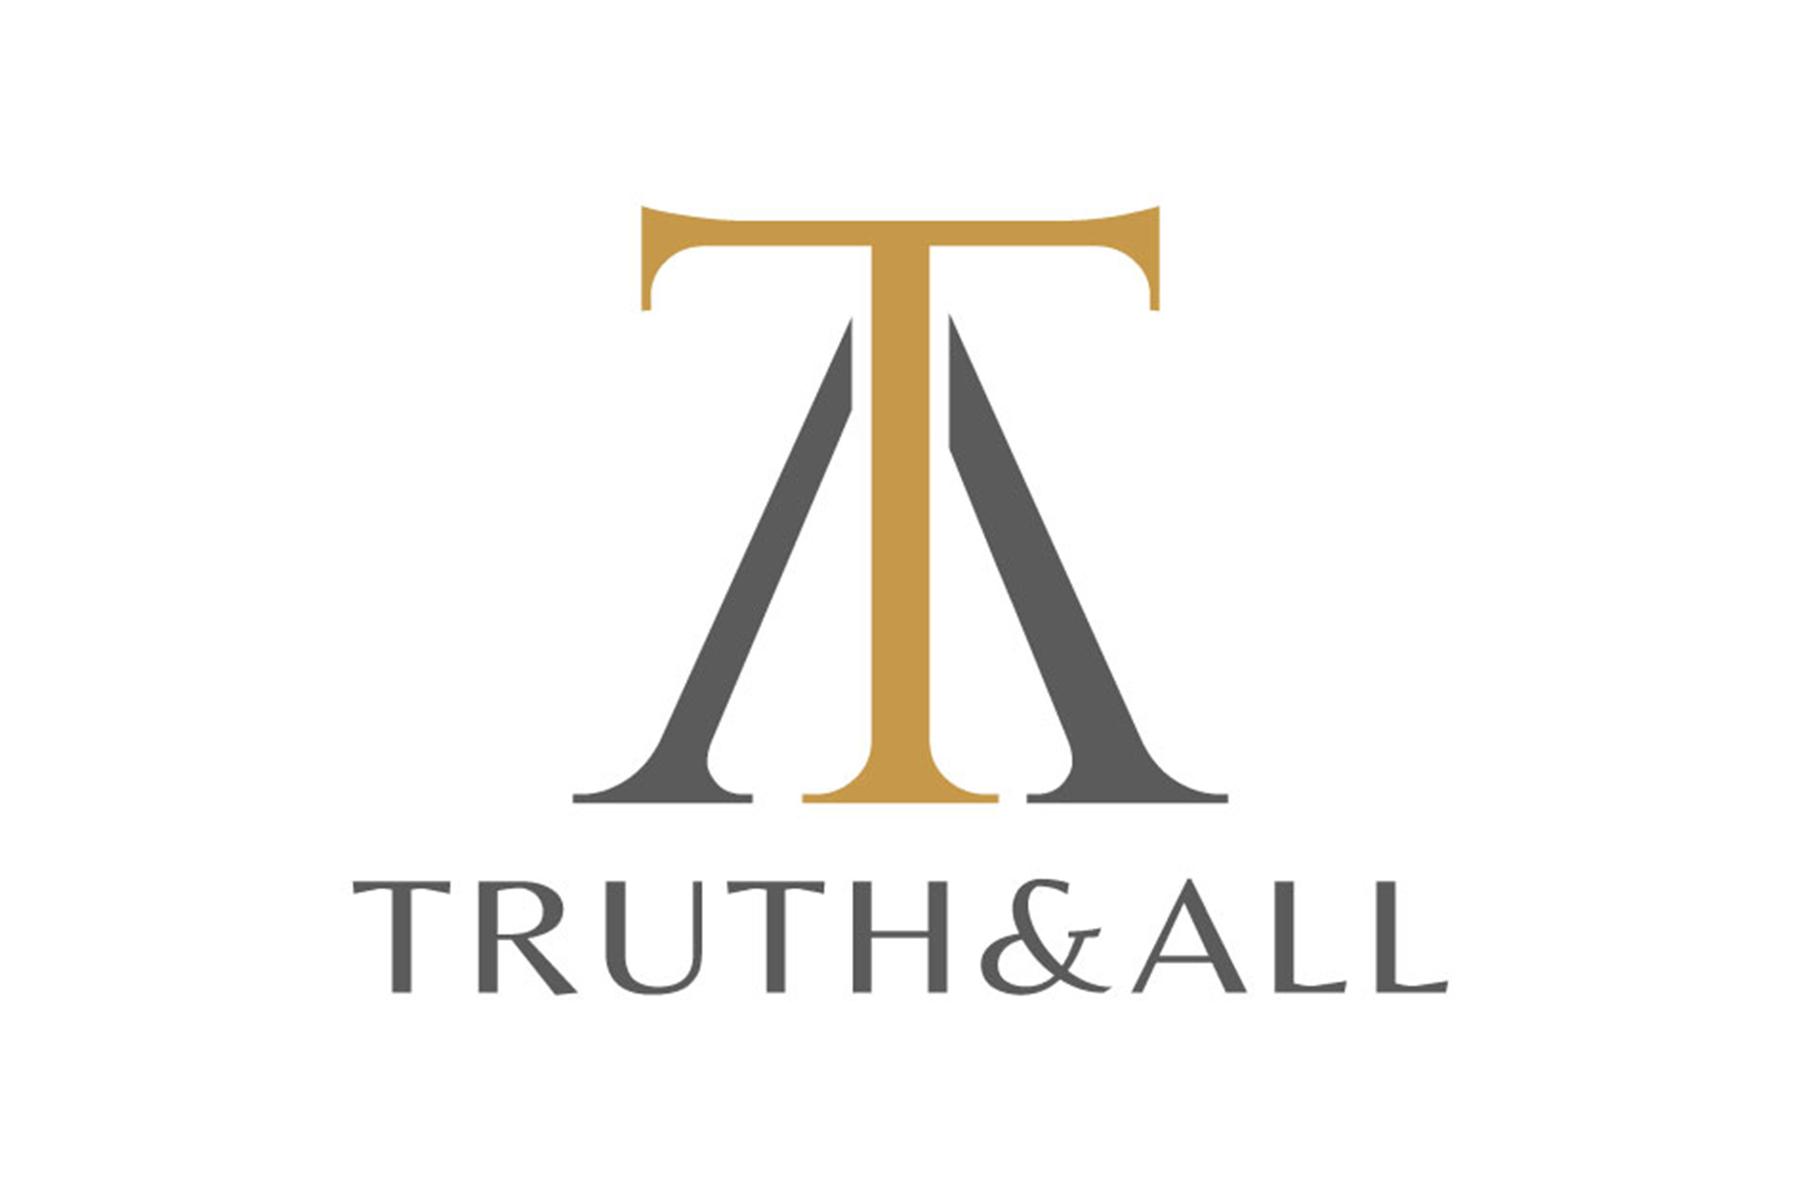 truthandall.jpg